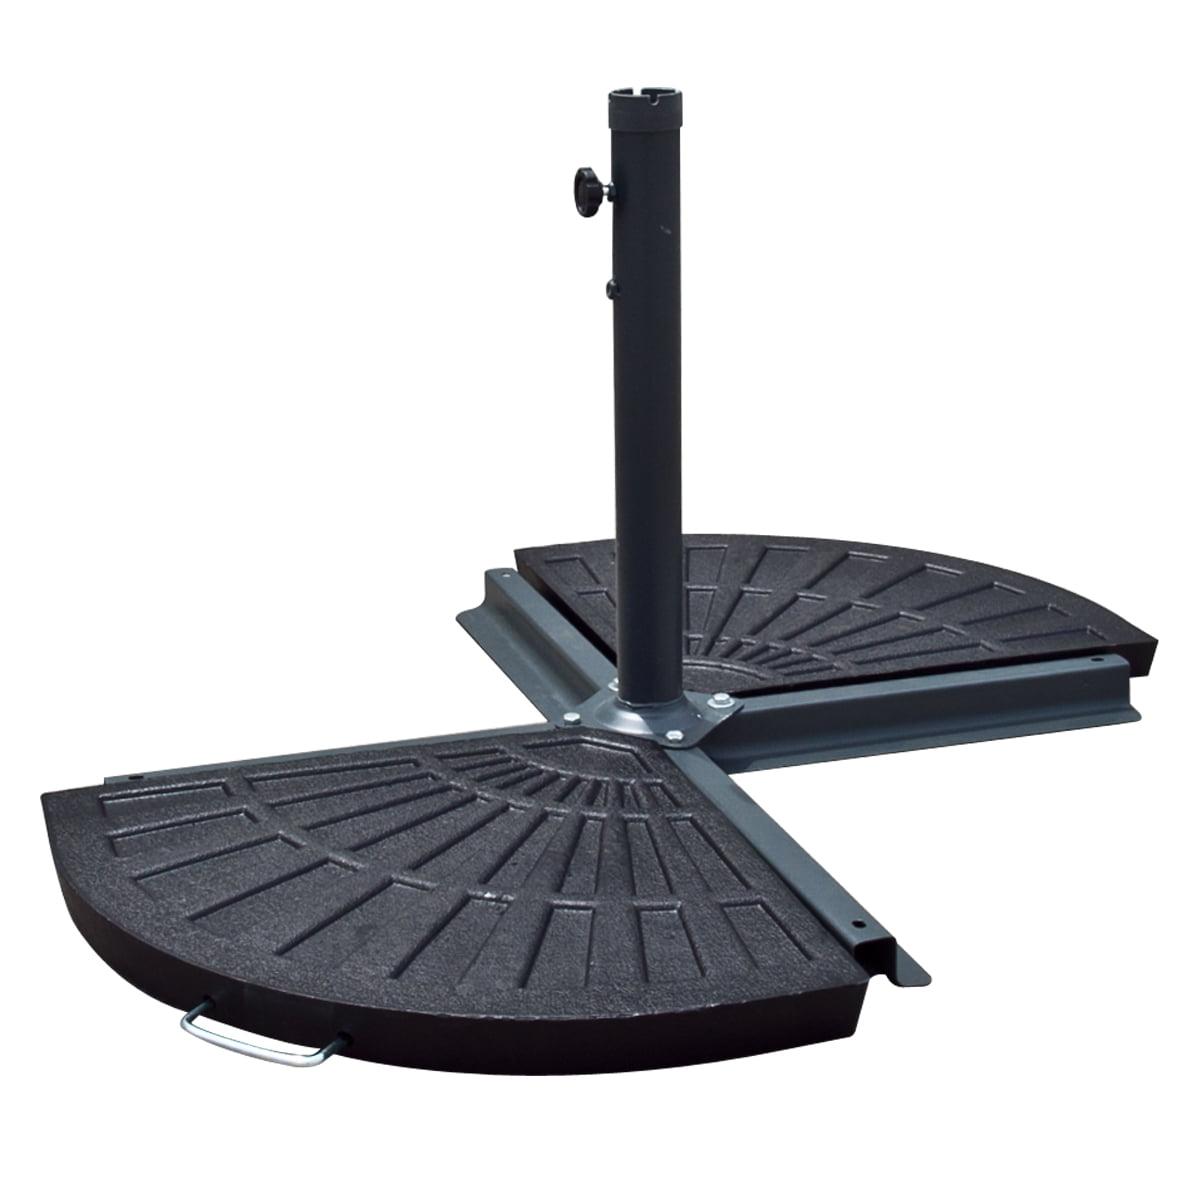 10u0027 ft feet patio umbrella 30 lb resin base stand outdoor for aged metal decor walmartcom